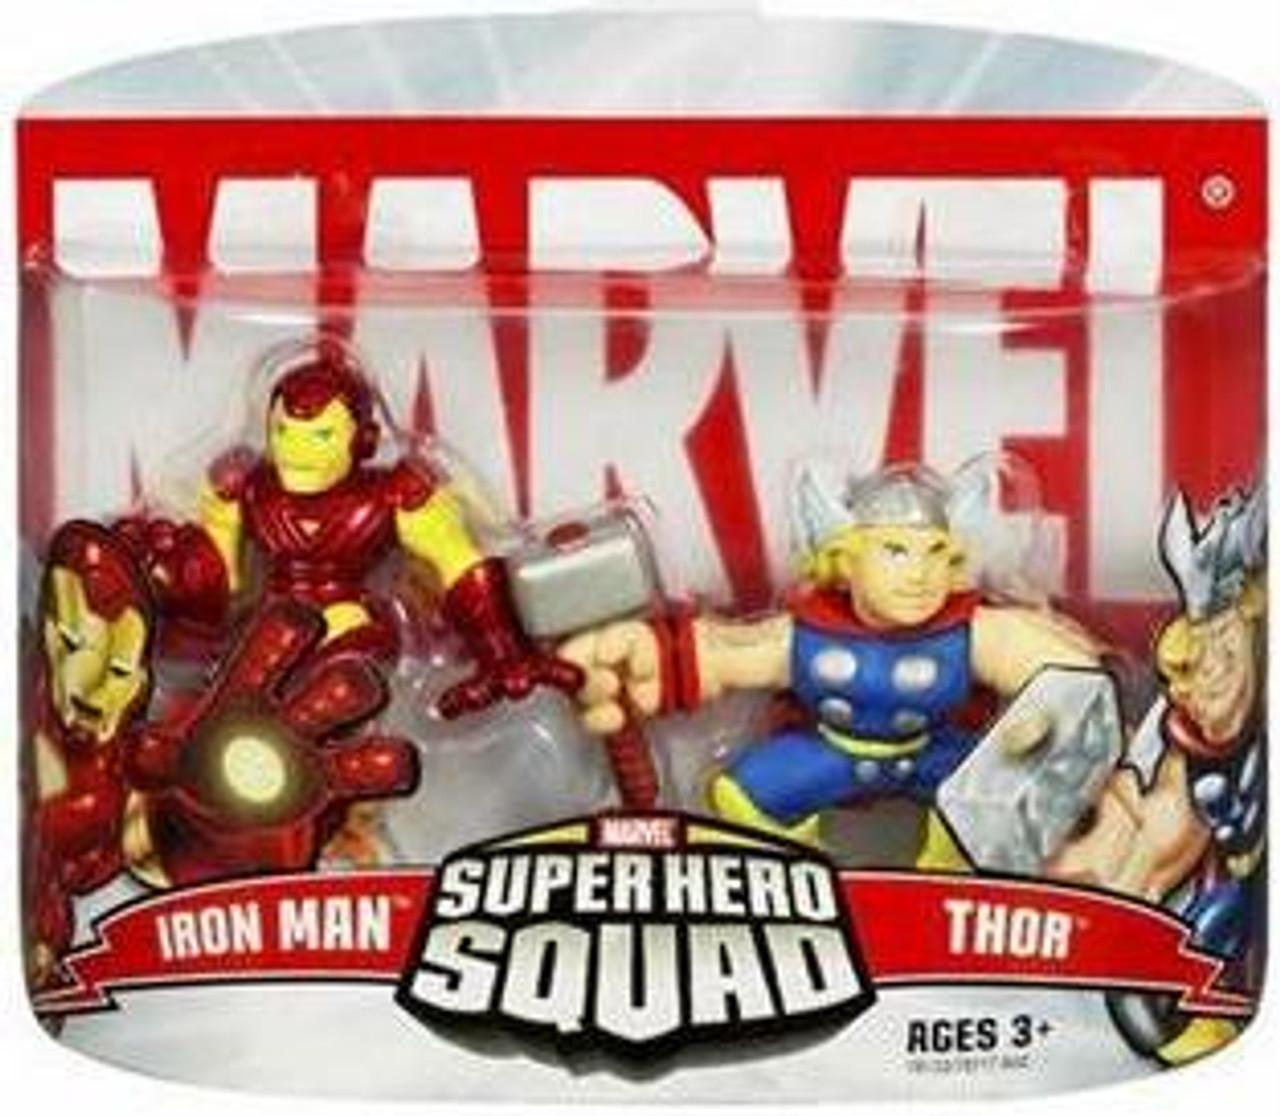 Marvel Super Hero Squad Series 2 Iron Man & Thor Action Figure 2-Pack